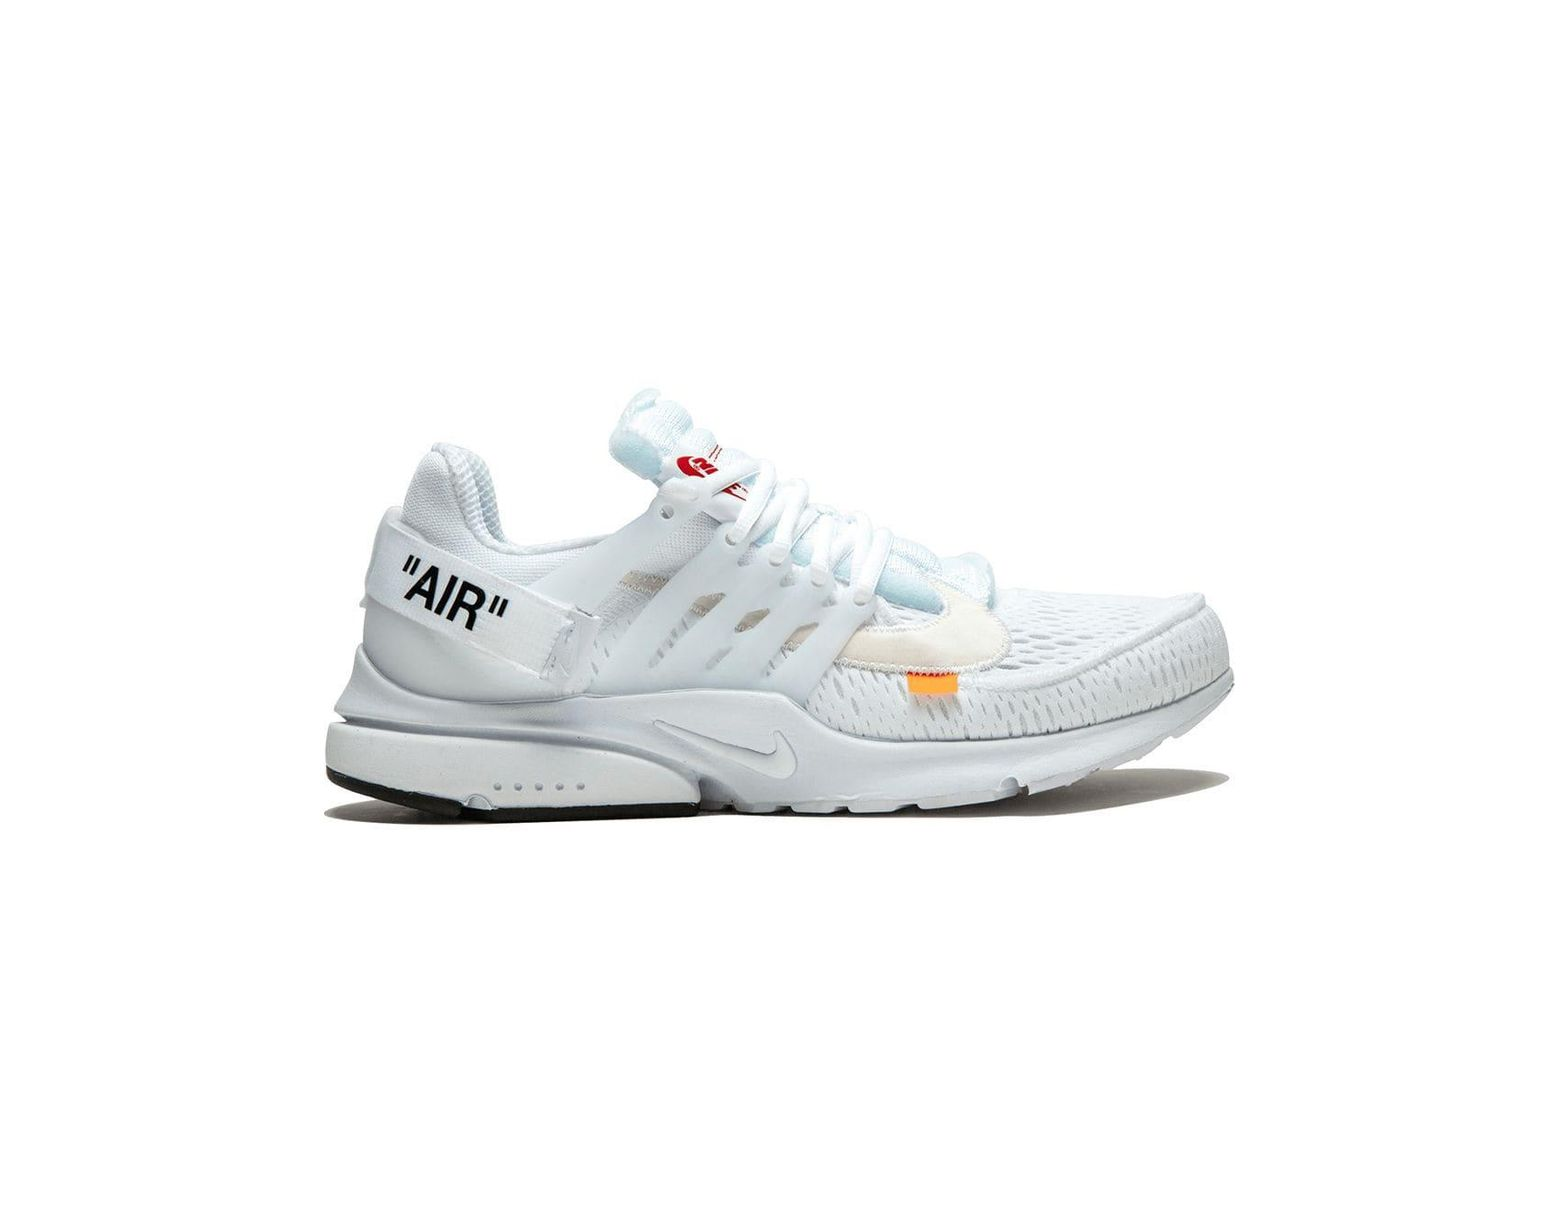 Coloris Nike The Femme Blanc 10Air Presto De X Sneakers 8ymNn0wvO